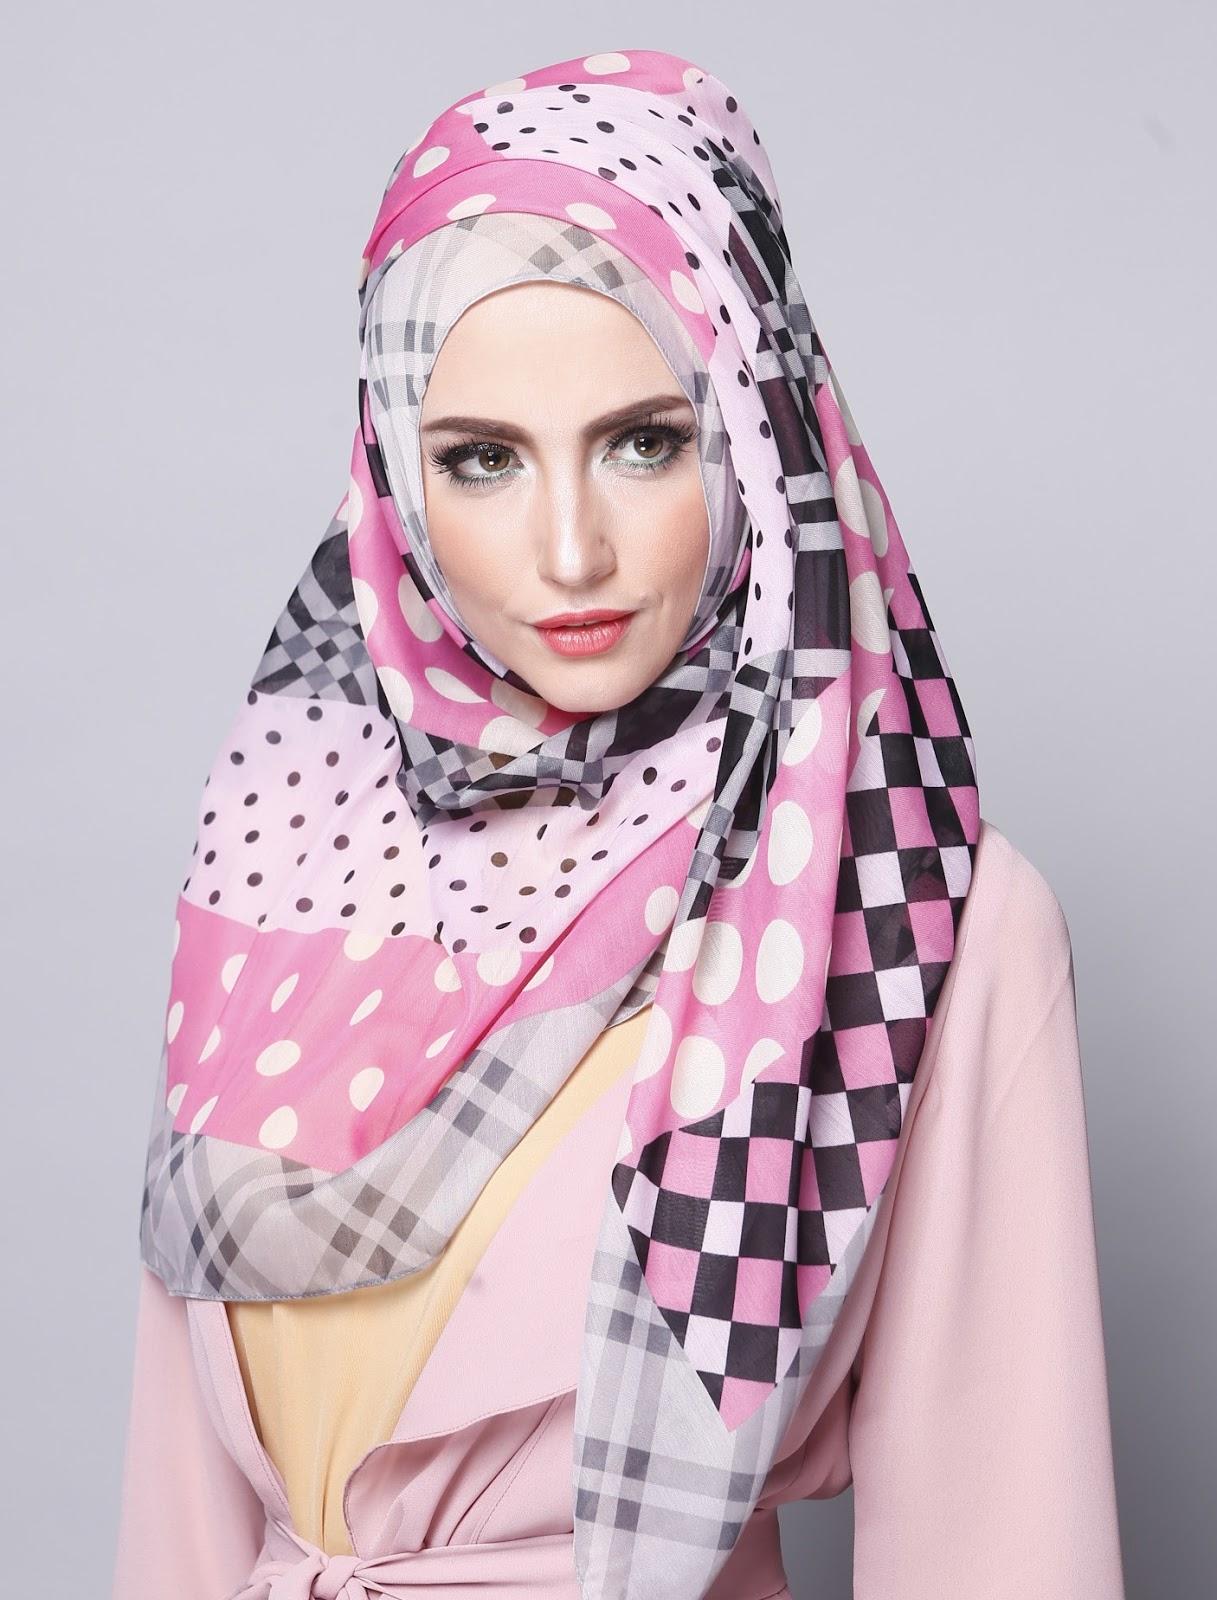 84 Ide Tutorial Jilbab Segi Empat Lebaran Paling Baru Tutorial Hijab Terbaru